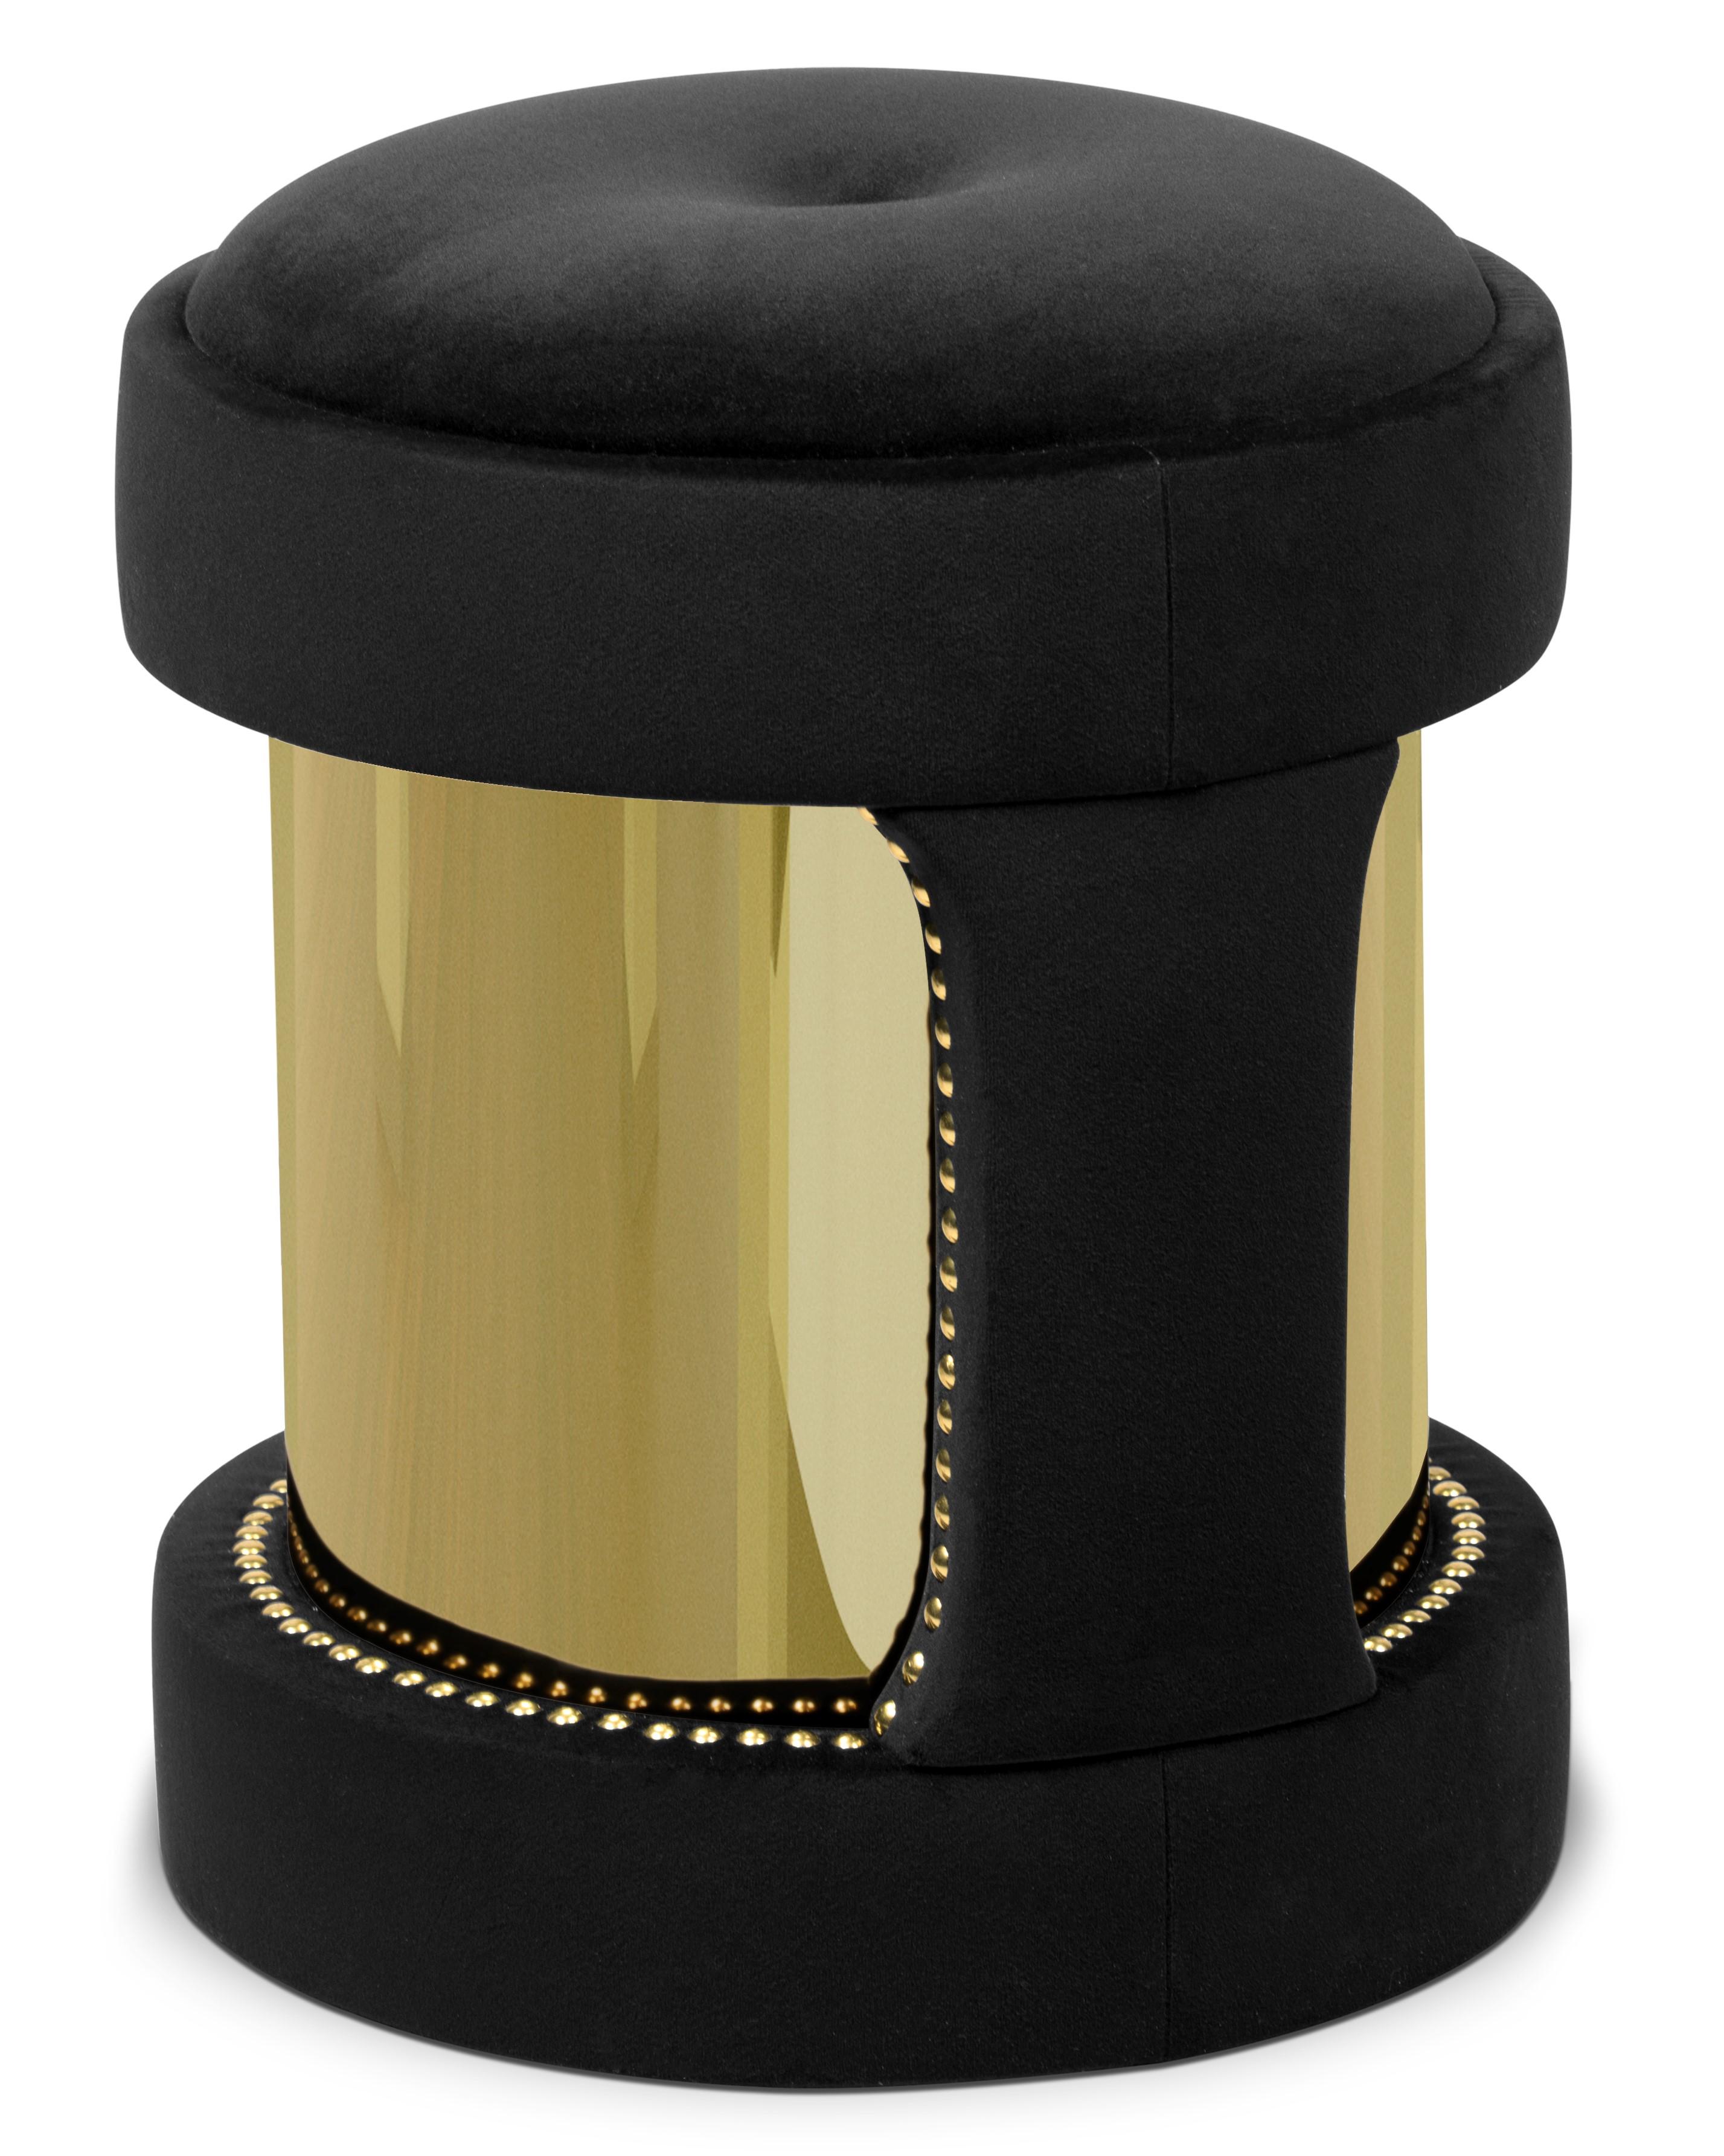 Bathroom Trends, interior design, maison valentina, bathroom design, trends for 2019 bathroom trends Shop the Look – Bathroom Trends by Maison Valentina armour stool 1 HR